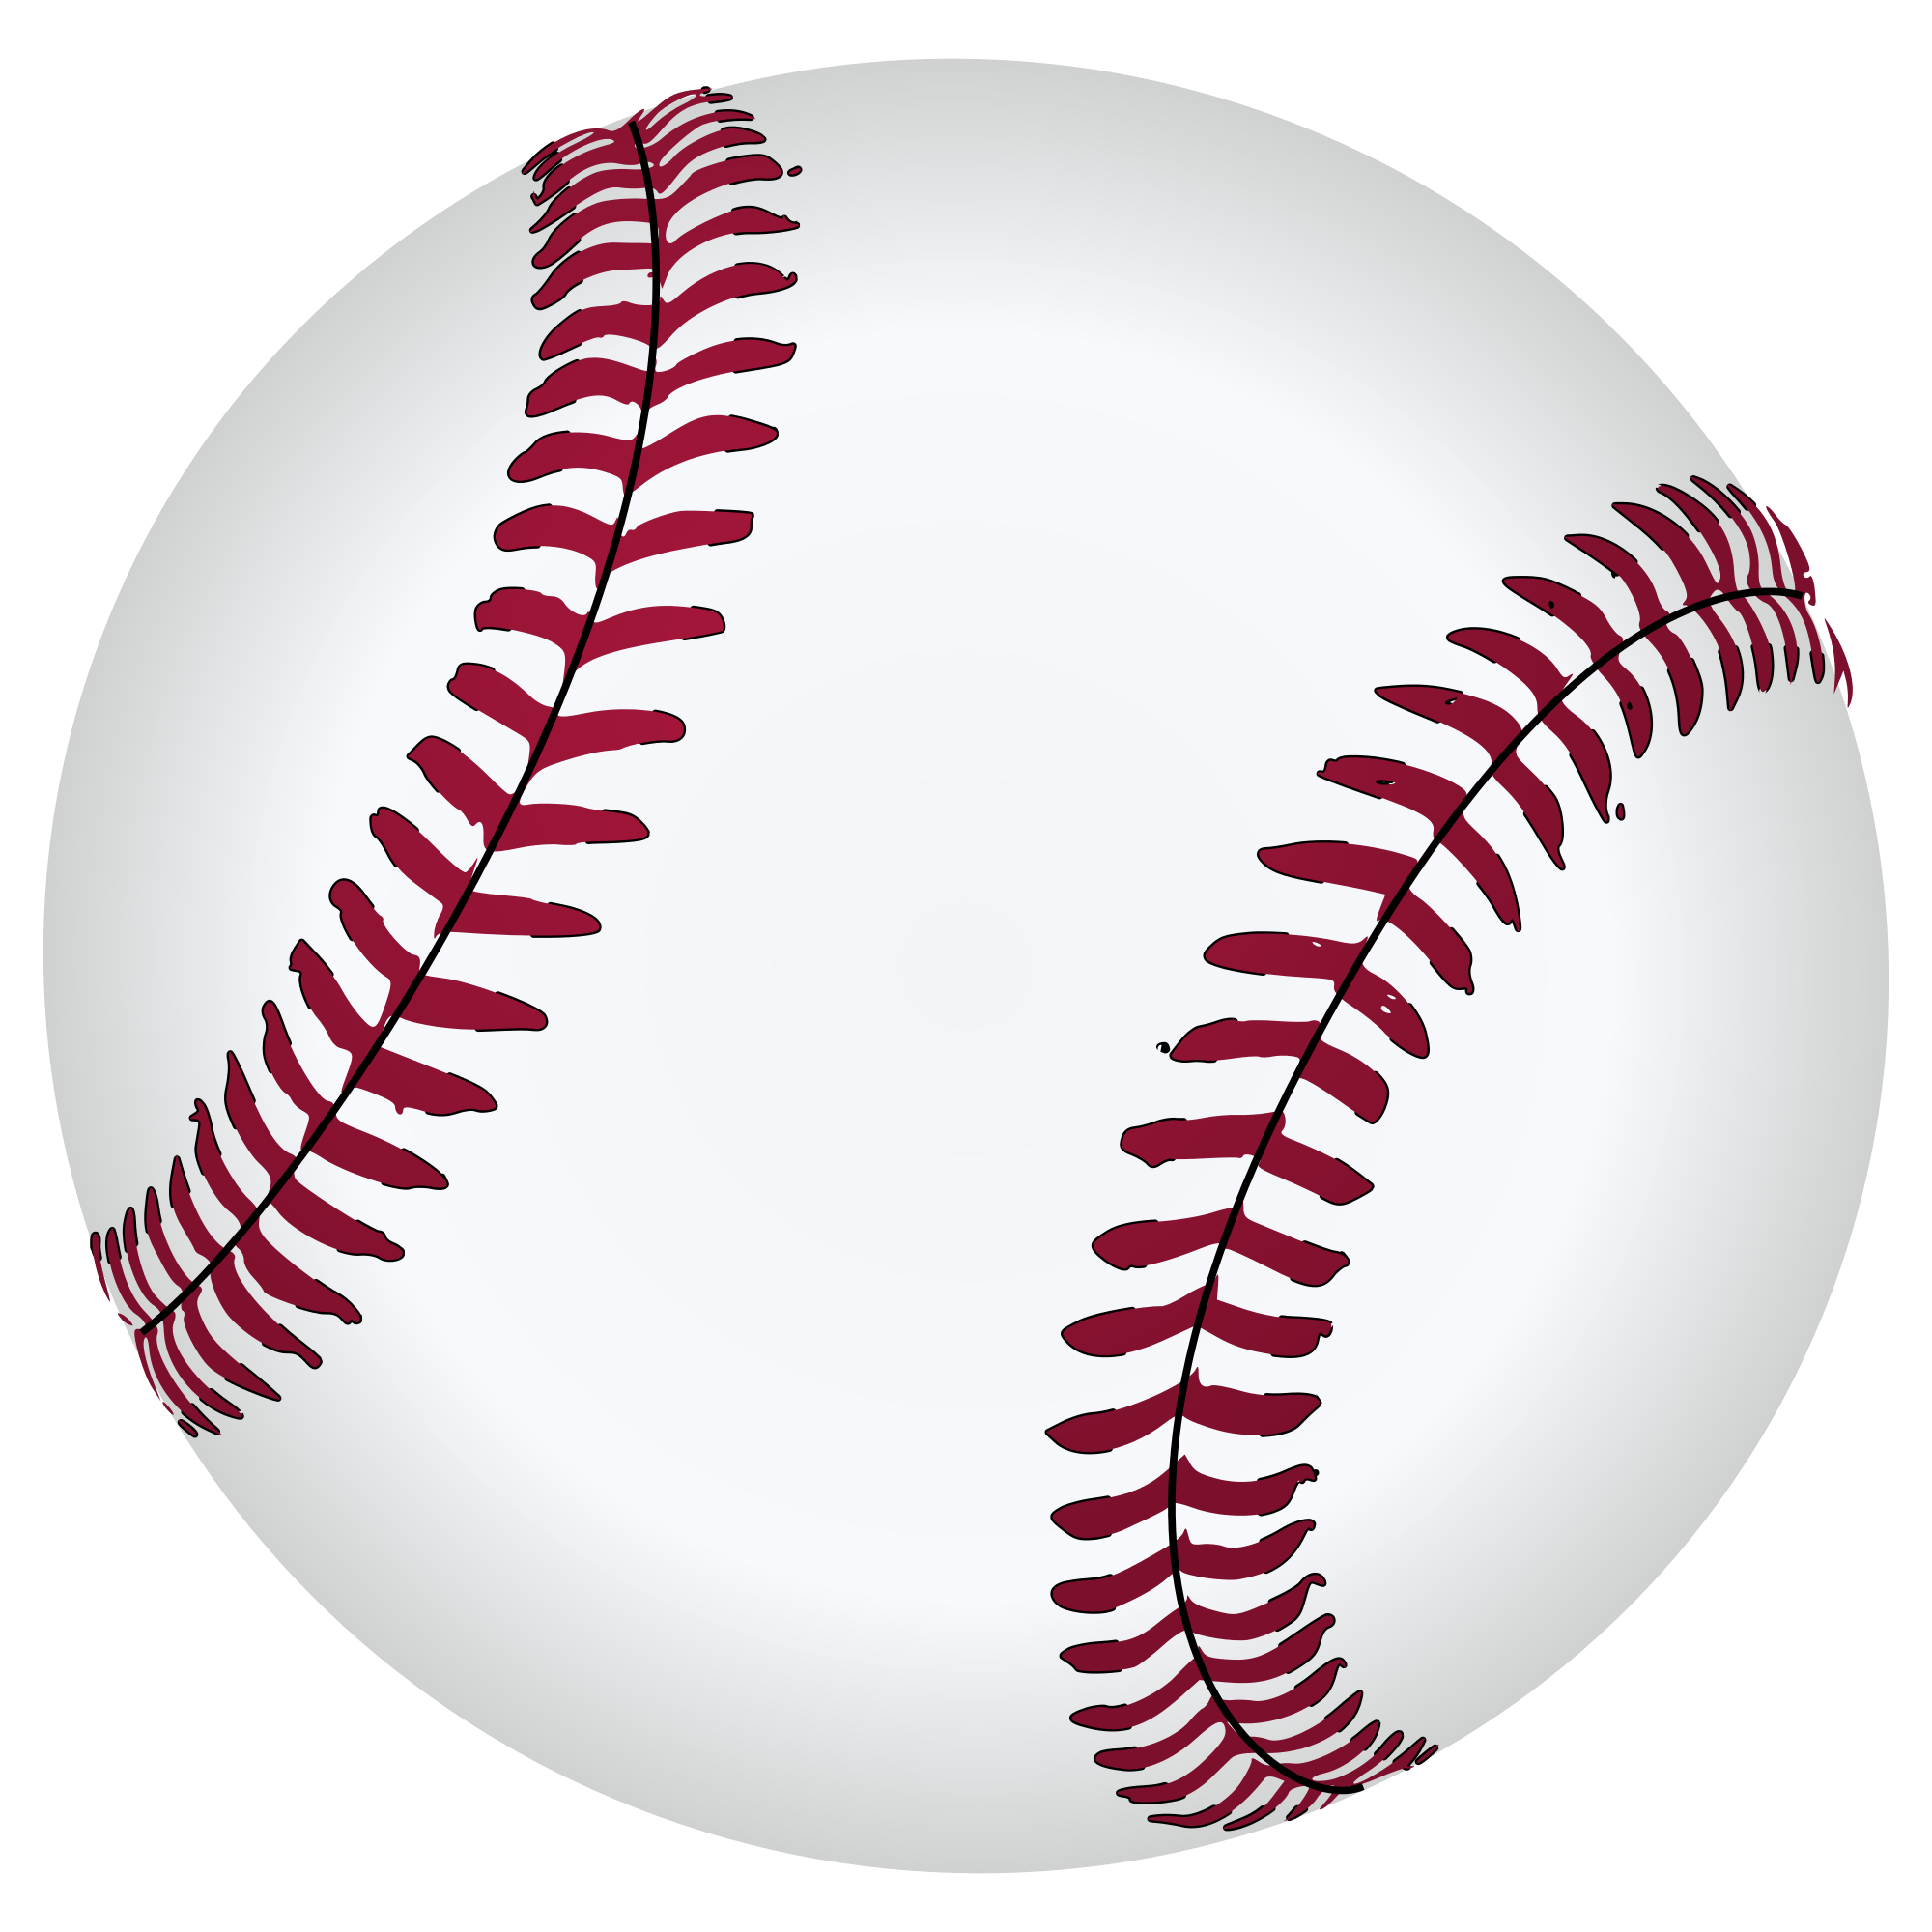 Baseball thread clipart png transparent download Baseball Seams Clip Art png transparent download